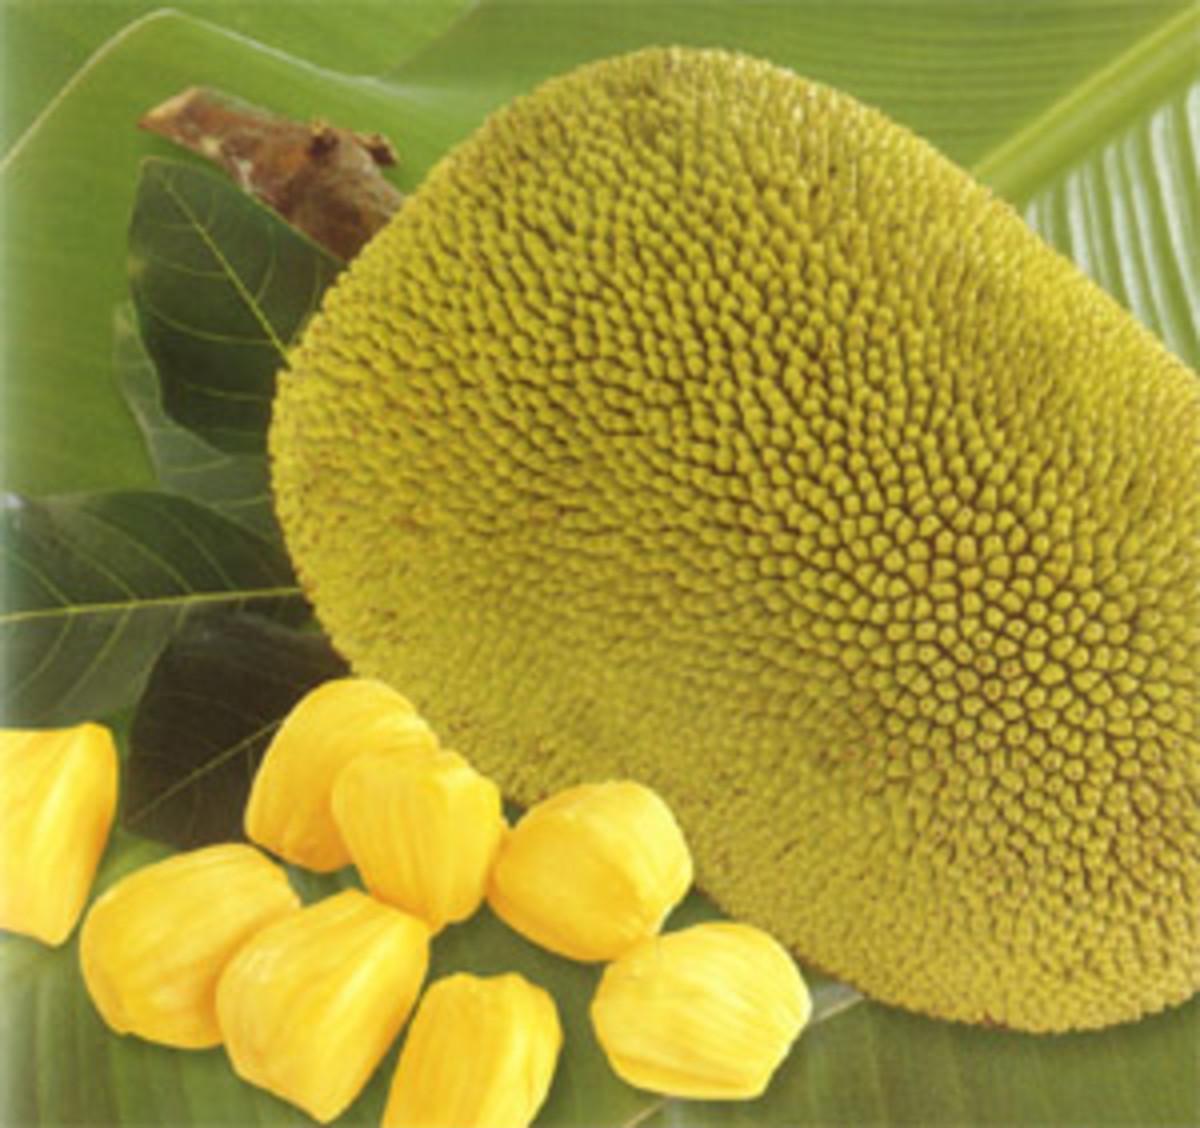 Jackfruit with numerous health benefits